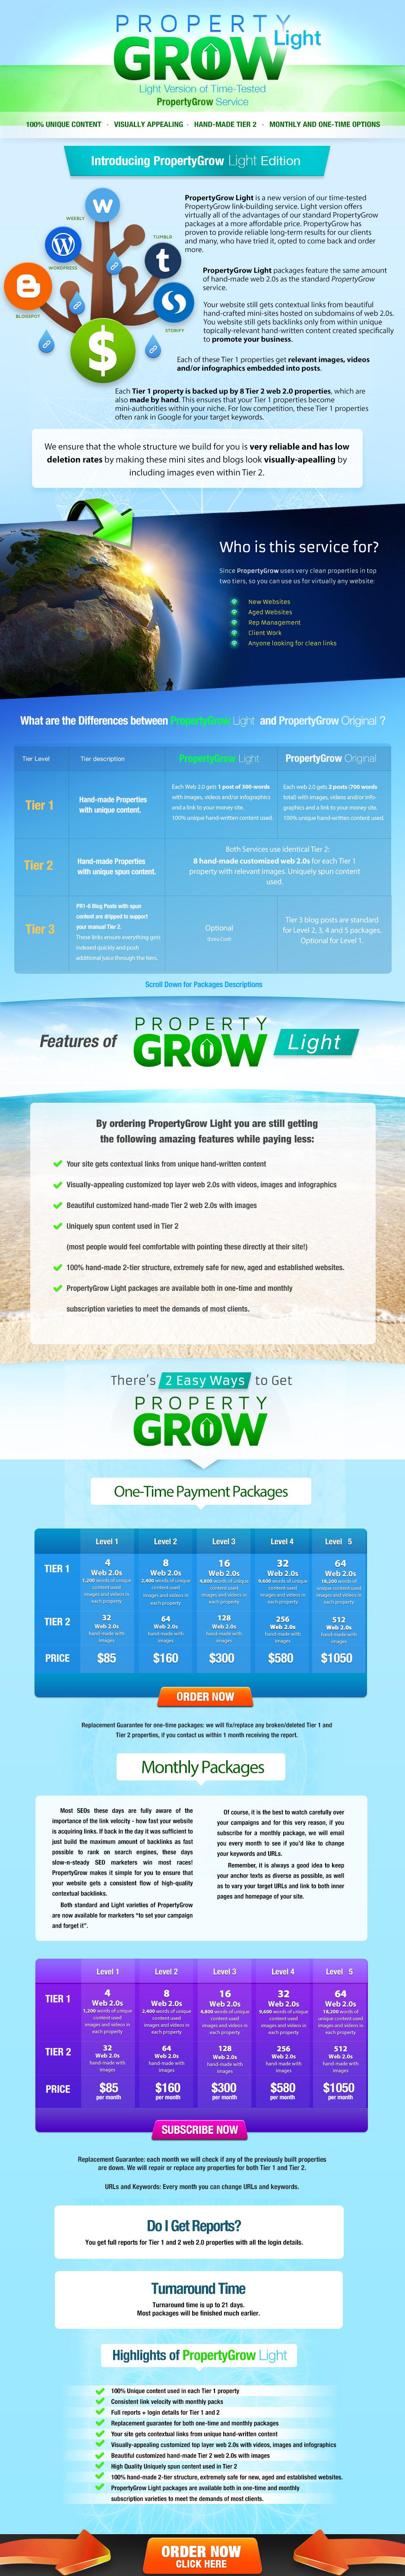 propertygrowlightseptember2016